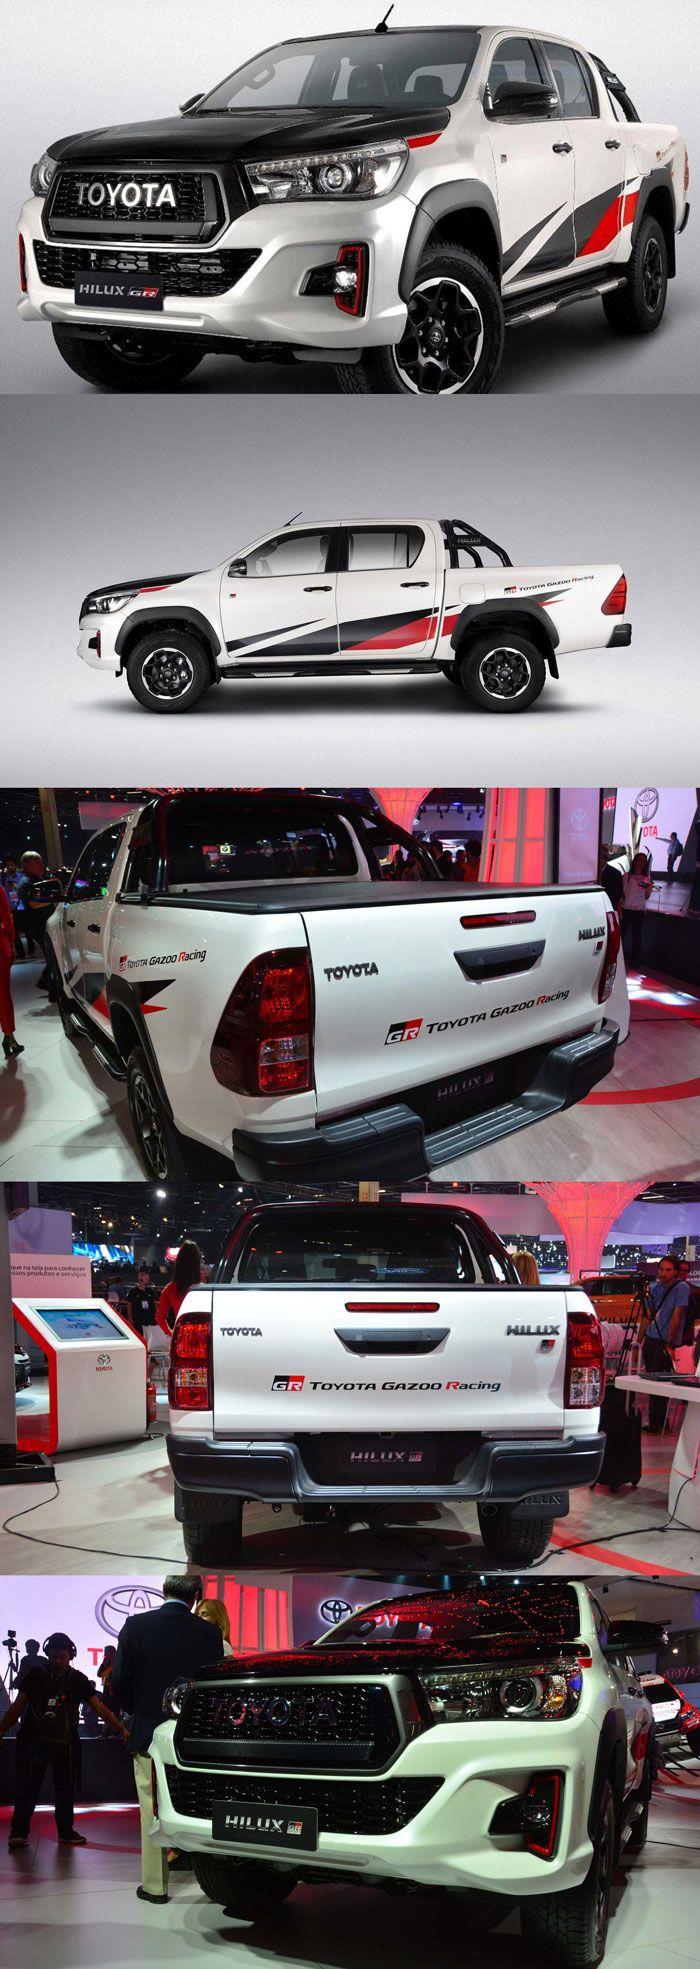 Toyota Hilux Gr Sport Toyota Hilux Pickup Toyota Hilux Toyota Toyota Accessories